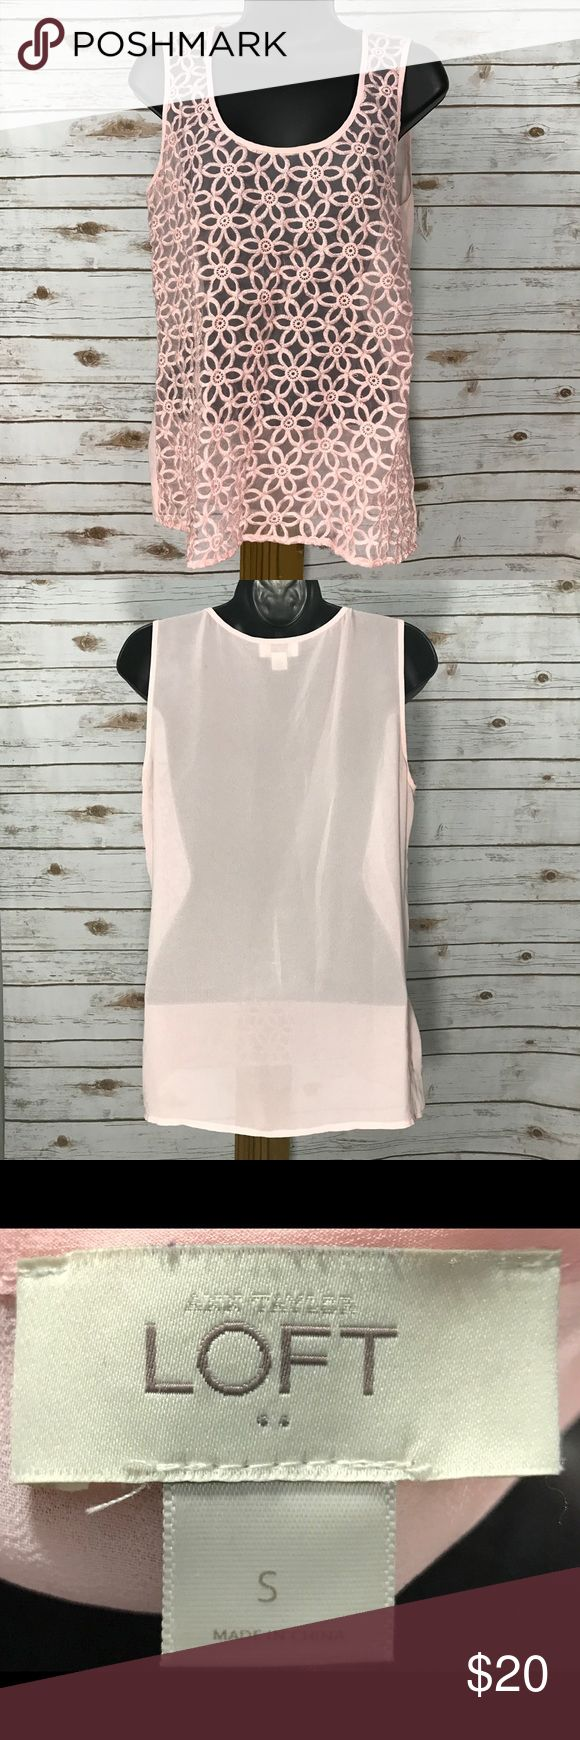 Anne Taylor Loft Pink Sheer Sleeveless Blouse SZ S Anne Taylor Loft Pink Sheer Sleeveless Blouse SZ S LOFT Tops Blouses